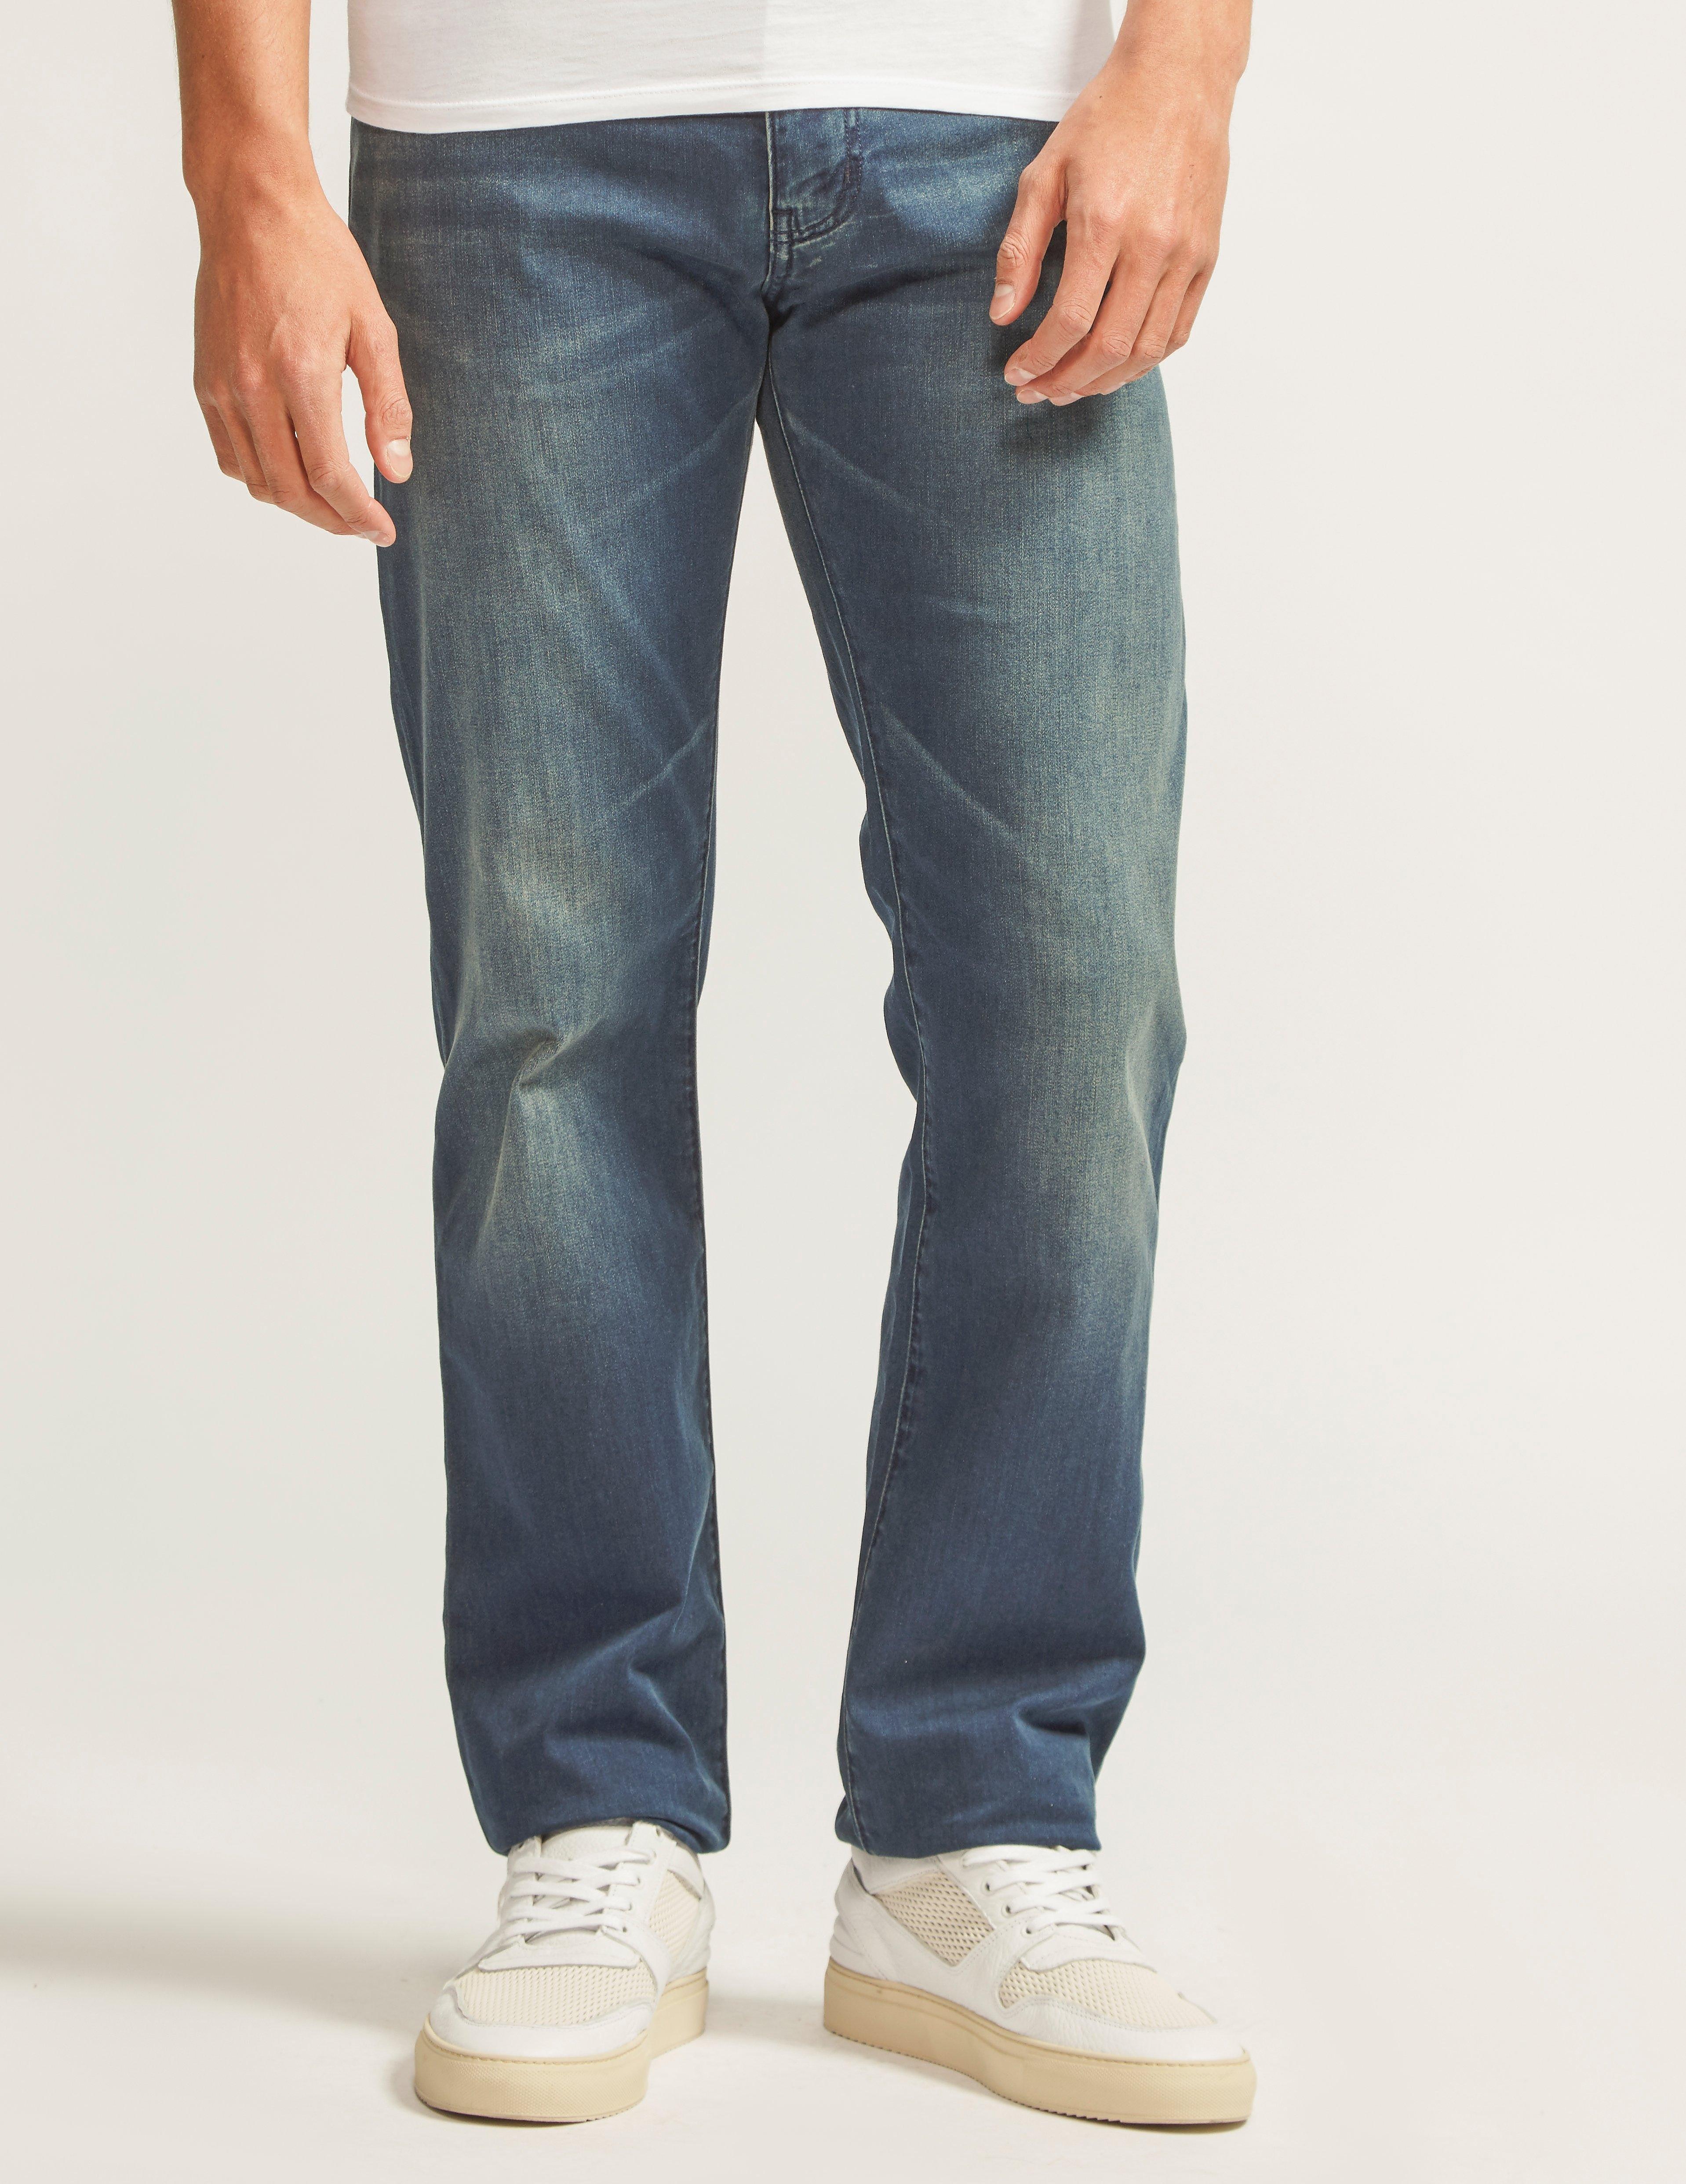 Armani Jeans J45 Slim Fit Jeans - Long